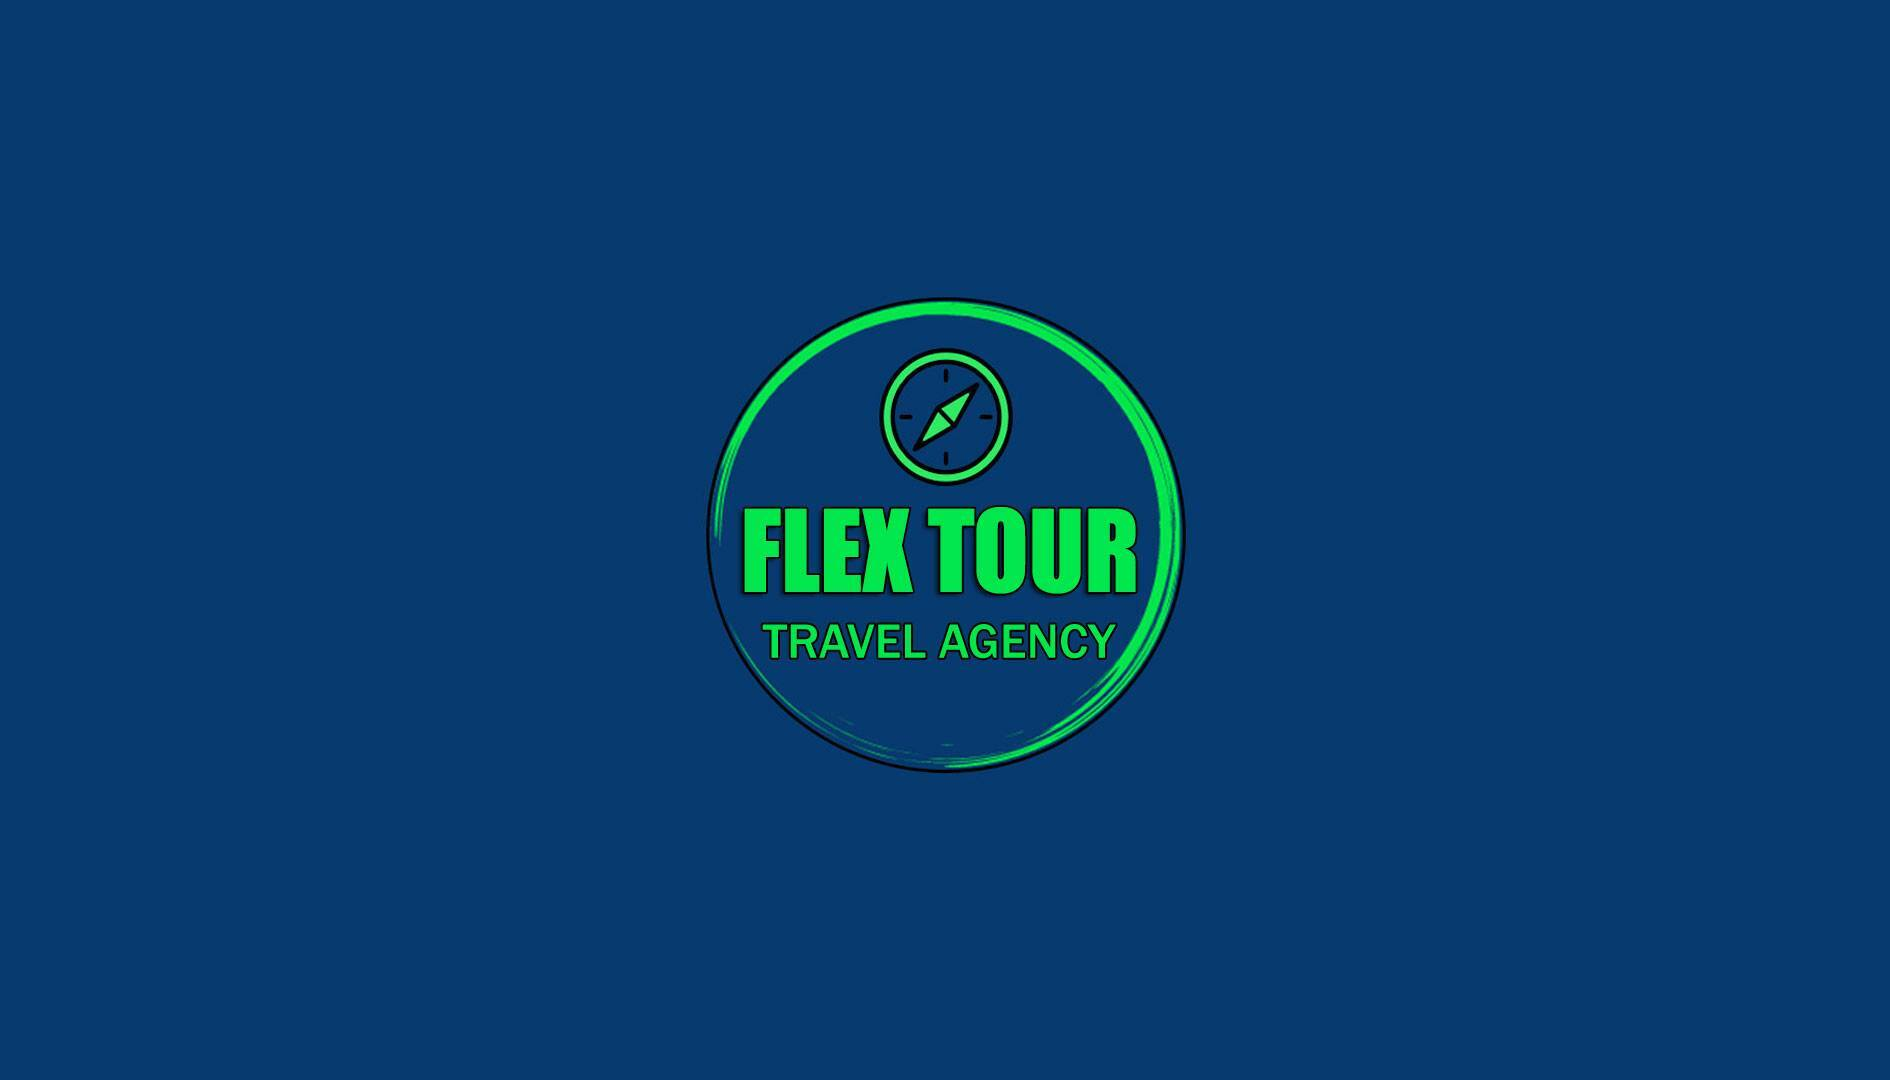 FLEX TOUR - Travel Agency